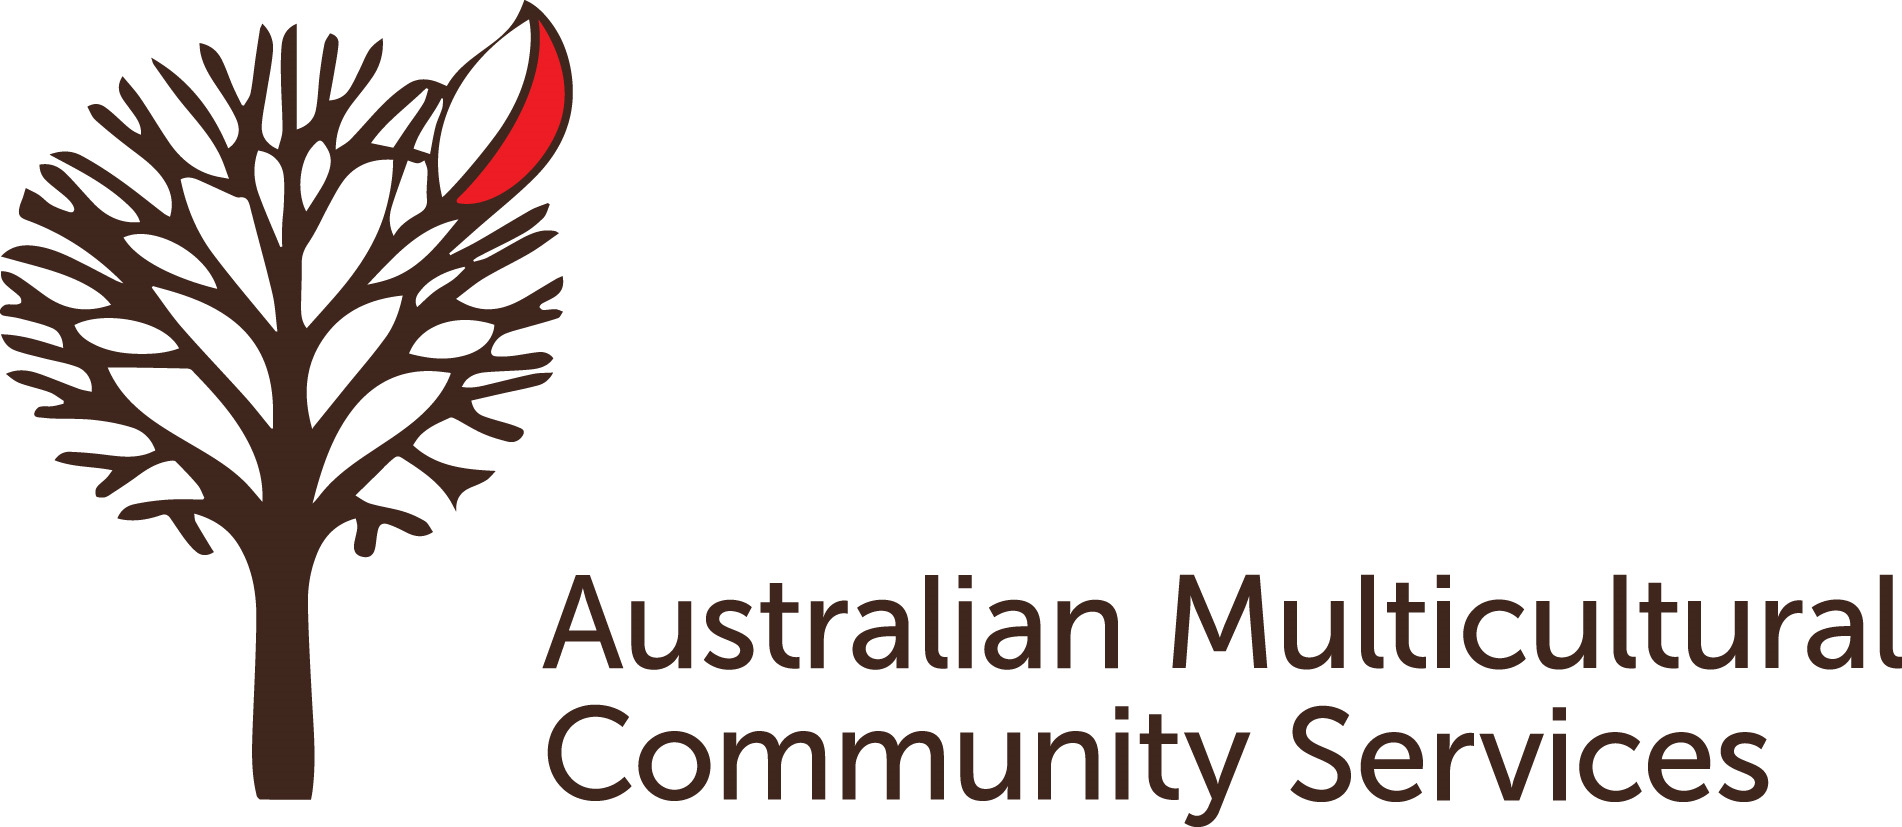 AMCS_Logo_Horiz_(002).png